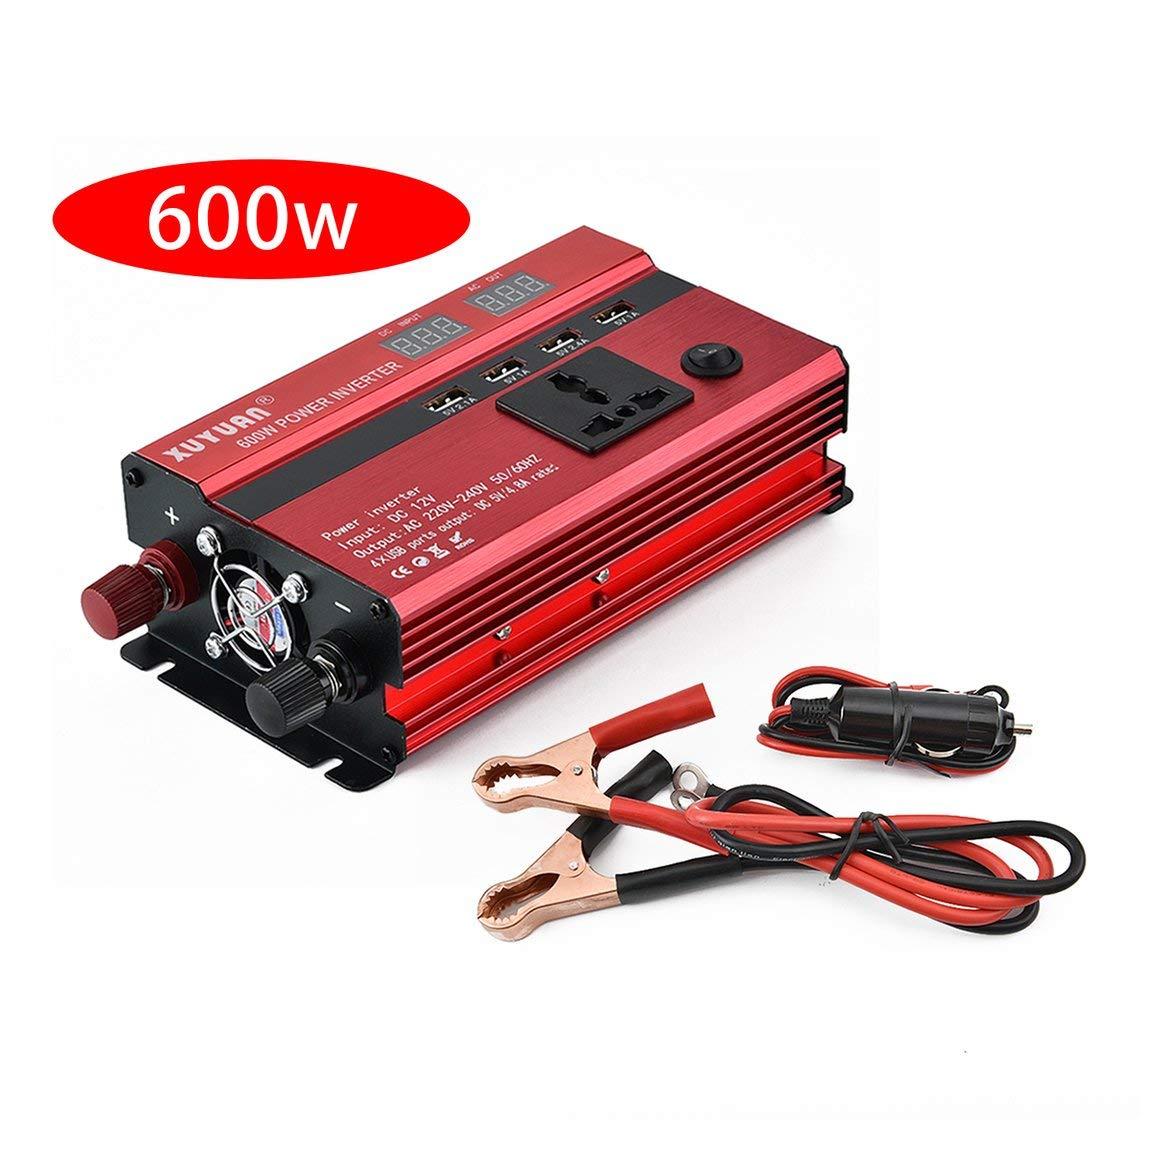 Funnyrunstore Professional 600W Power Inverter DC a AC Pantalla LED Home Fan Cooling Car Converter para electrodomé sticos Plug and Play (24v-220v)